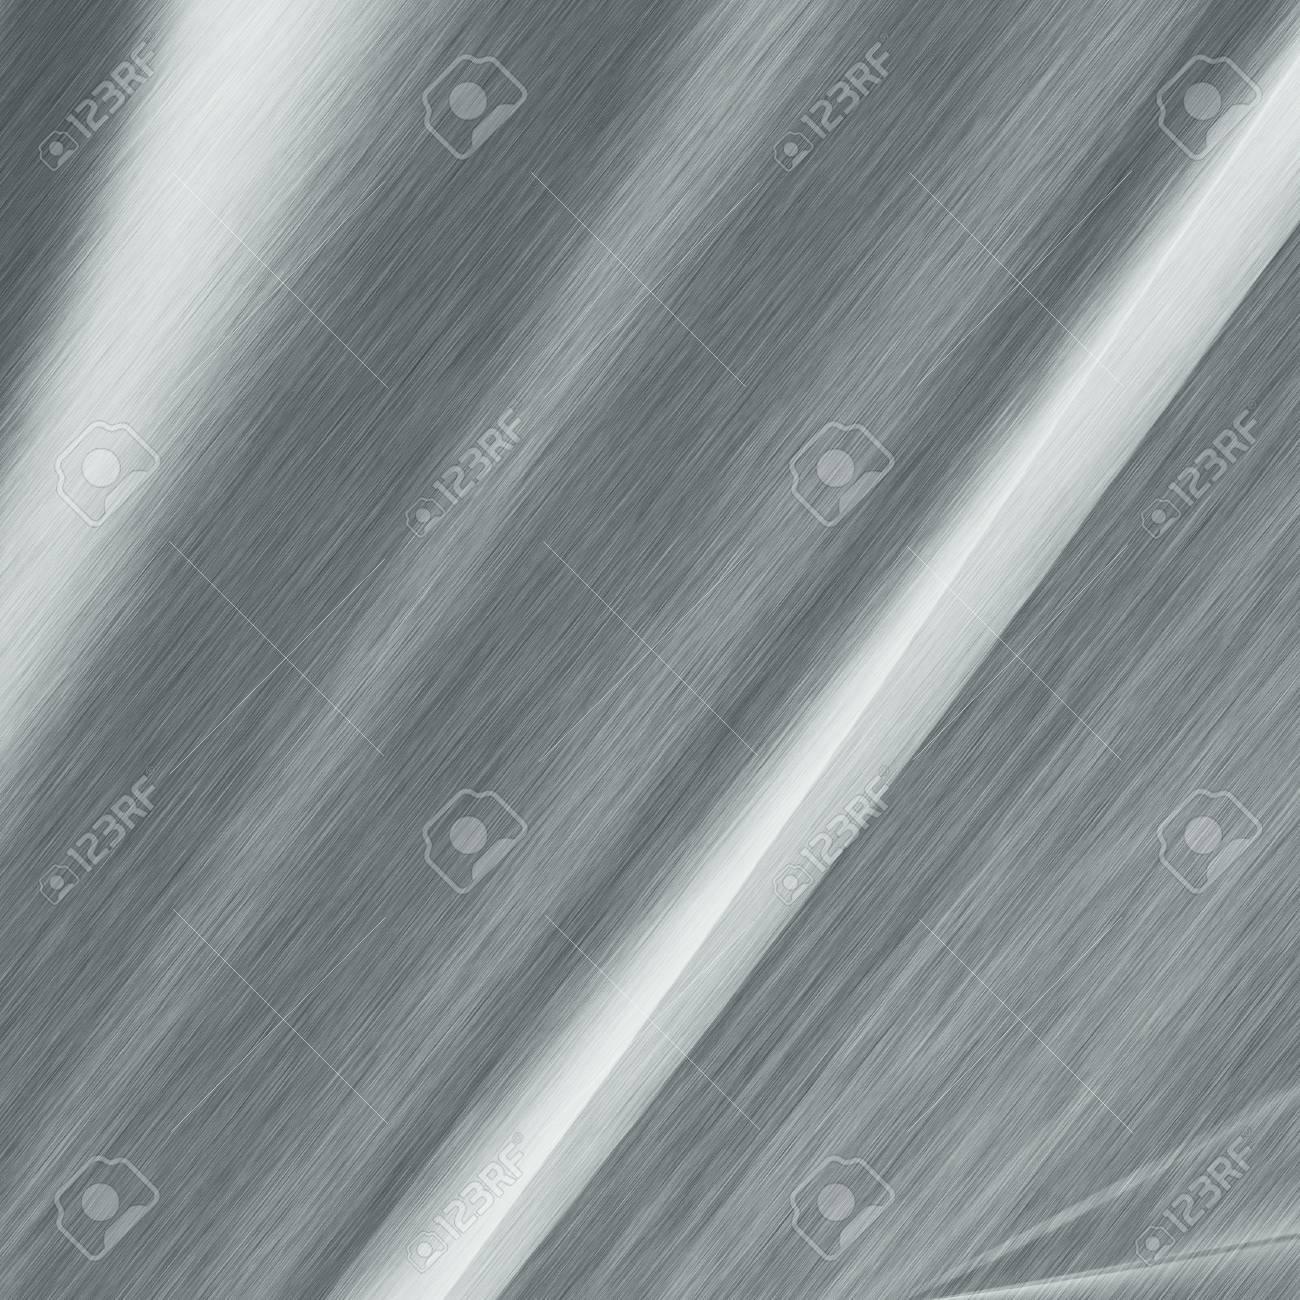 gray background white lines stripe pattern texture Stock Photo - 22417487